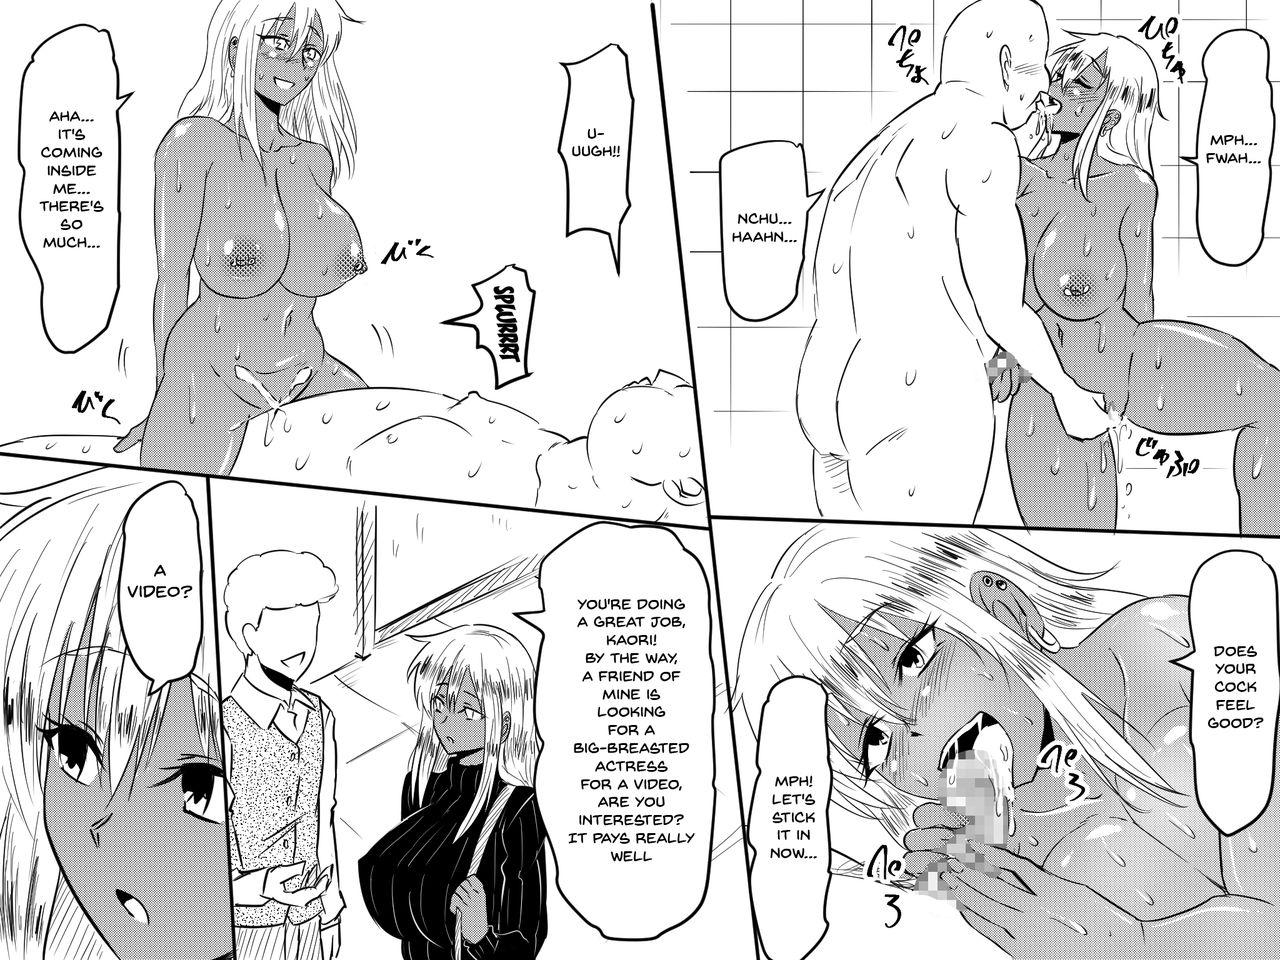 [Mikezoutei] Netorare Haha ~Kachiki de Kimottama no Okaa-san ga Boku o Ijimeru Aitsu no Onna ni Naru Hanashi~   Mom NTR ~A Story Of How My Gutsy Mom Ended Up Becoming My Bully's Plaything~ [English] {Doujins.com} 72